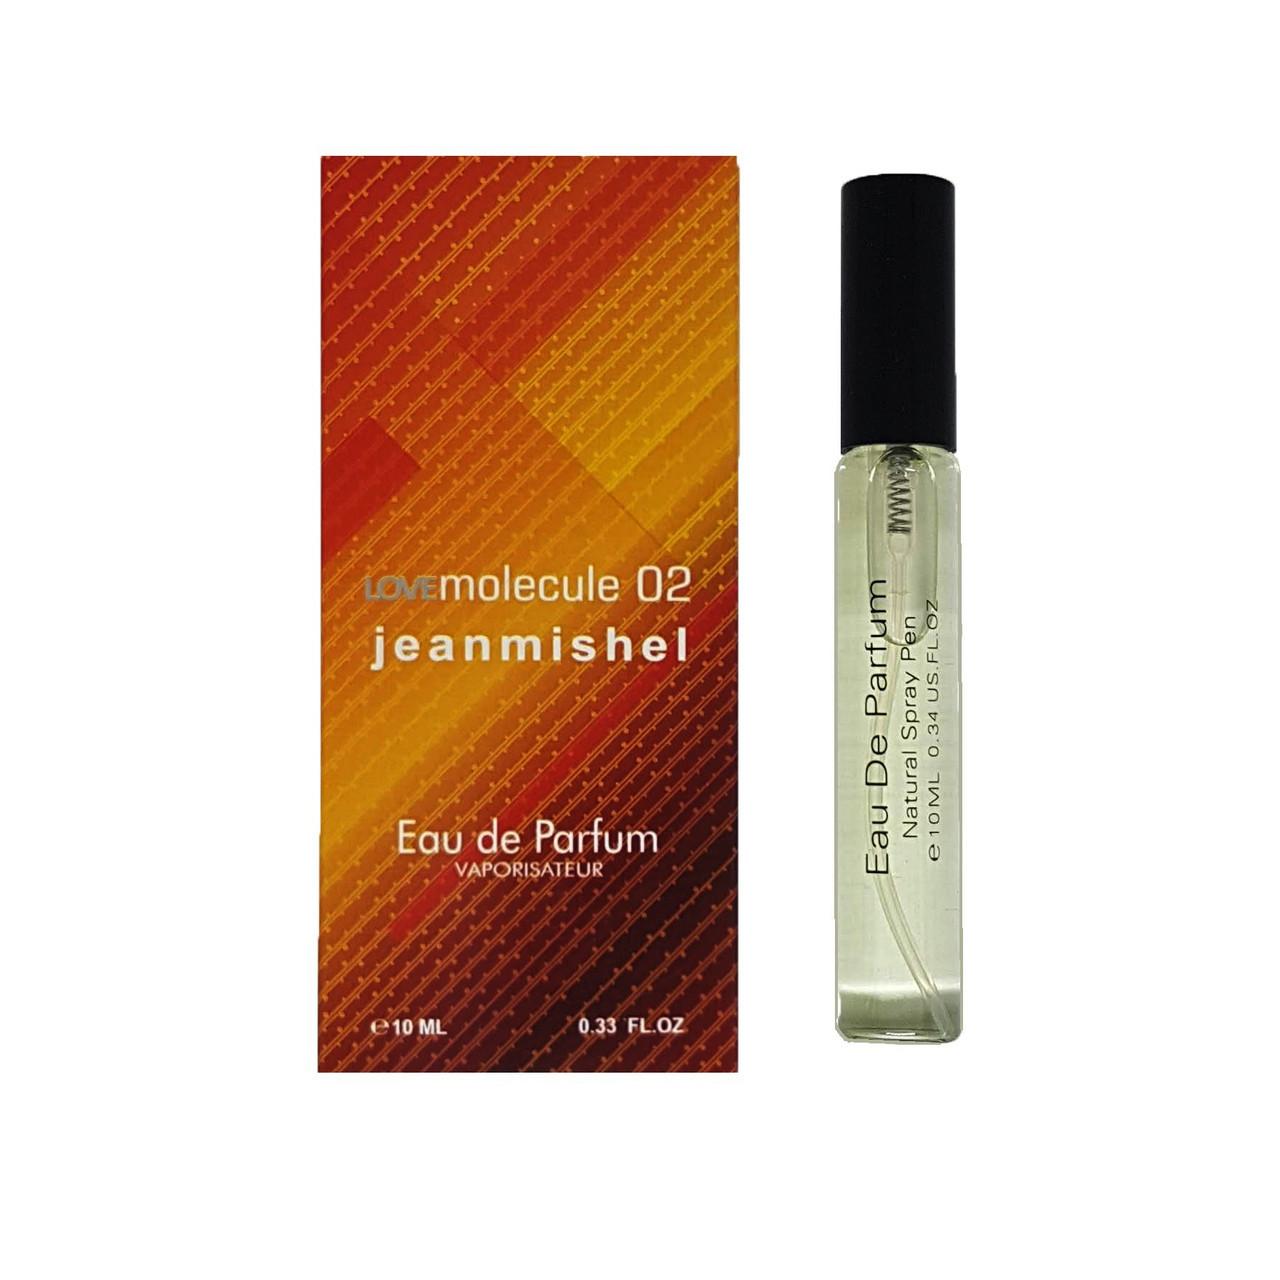 Jeanmishel Love Molecule 02 (95) 10ml